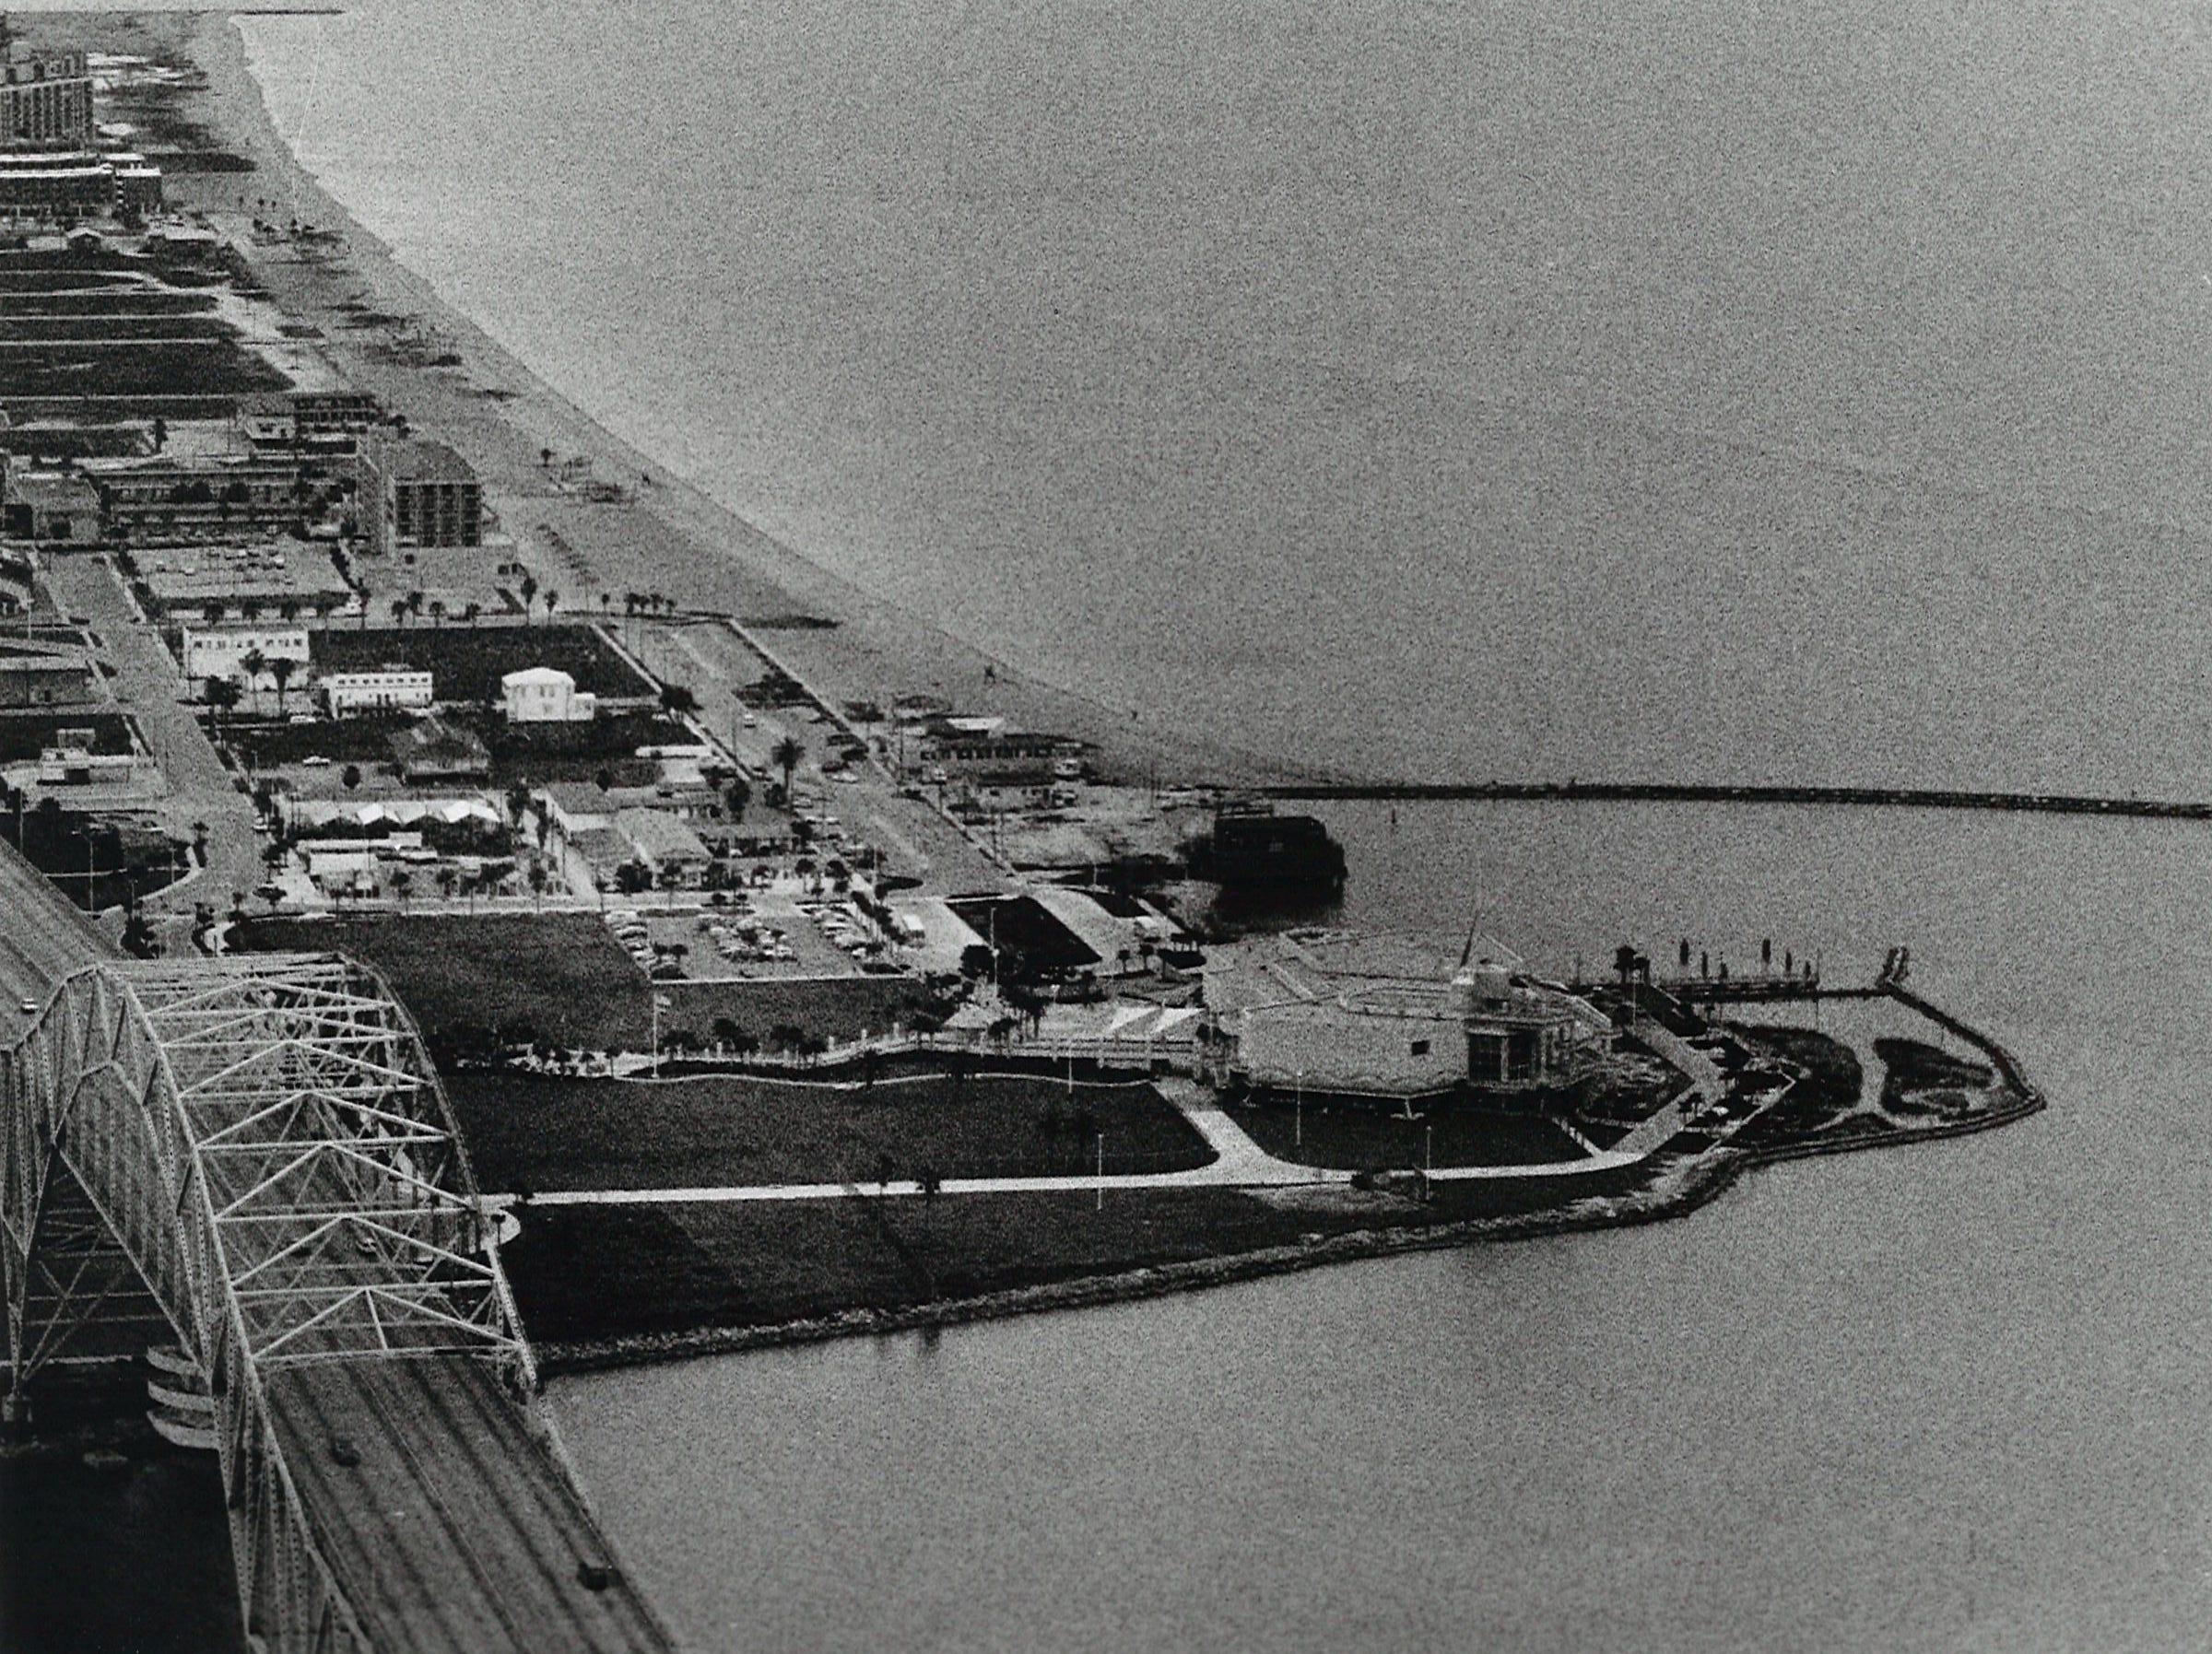 The site for the USS Lexington awaits the aircraft carrier's arrival next to the Texas State Aquarium on Corpus Christi's North Beach on Jan. 23, 1992.